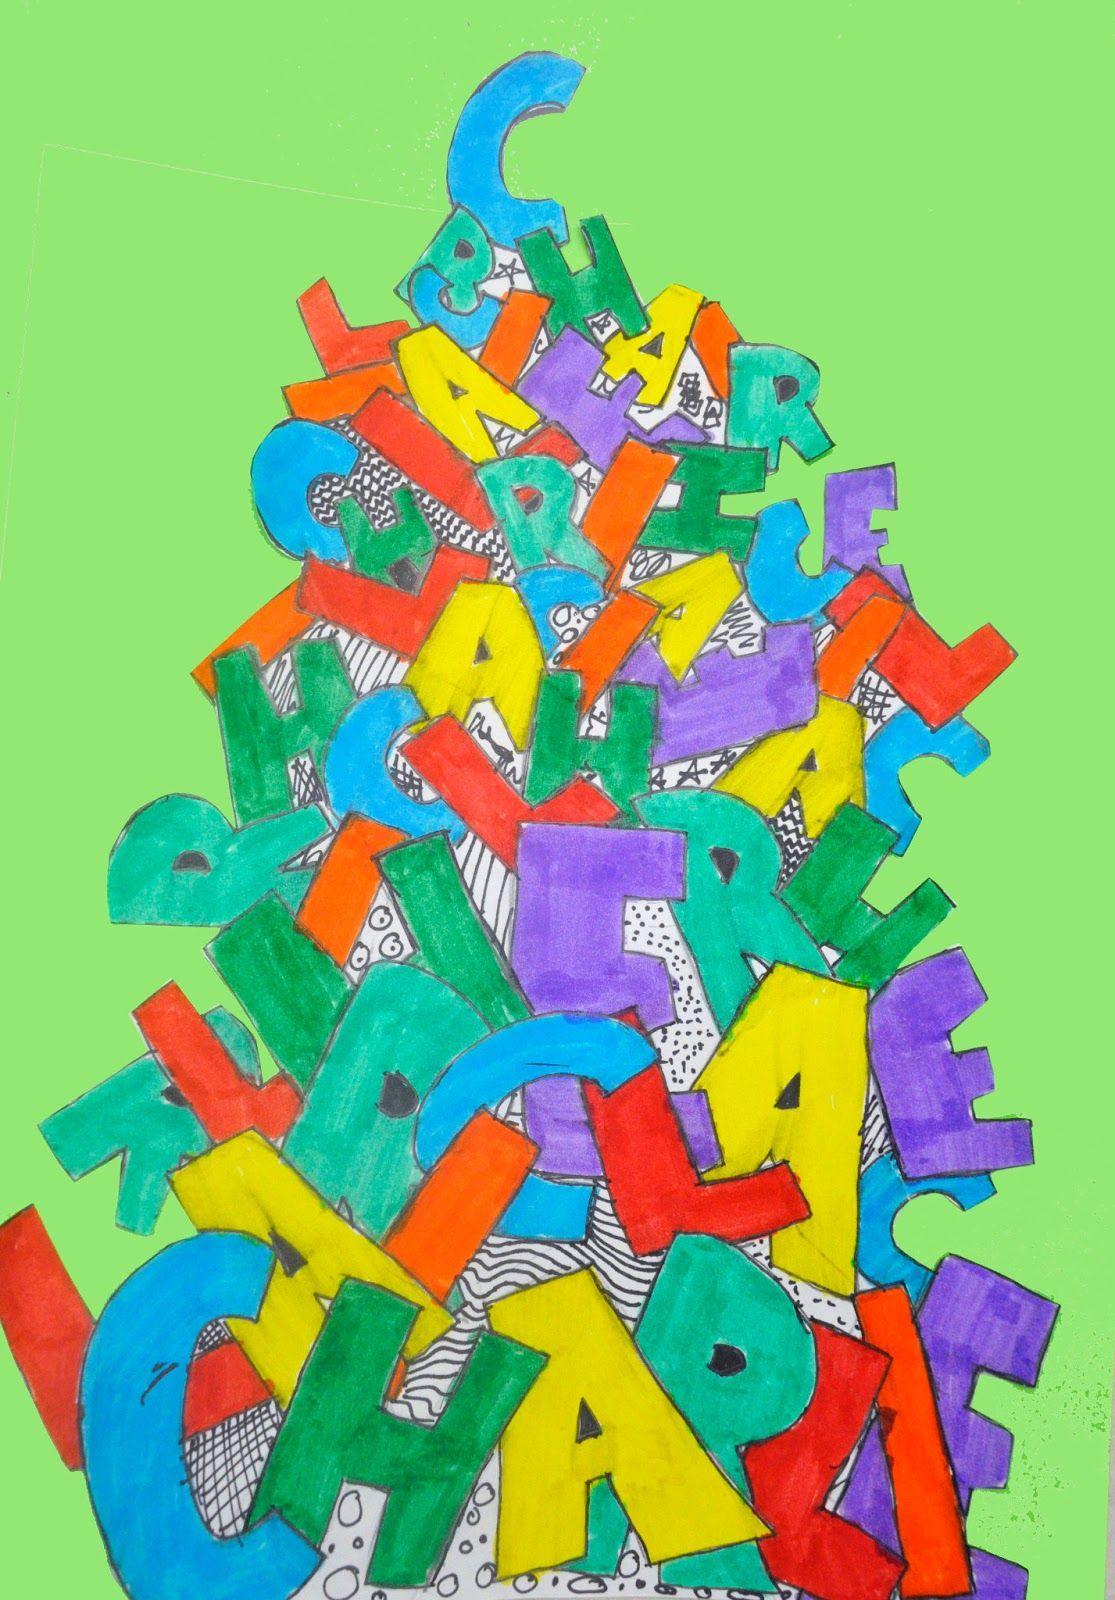 Artisan Des Arts Raining Letters Name Art Grade 5 6 Art Name